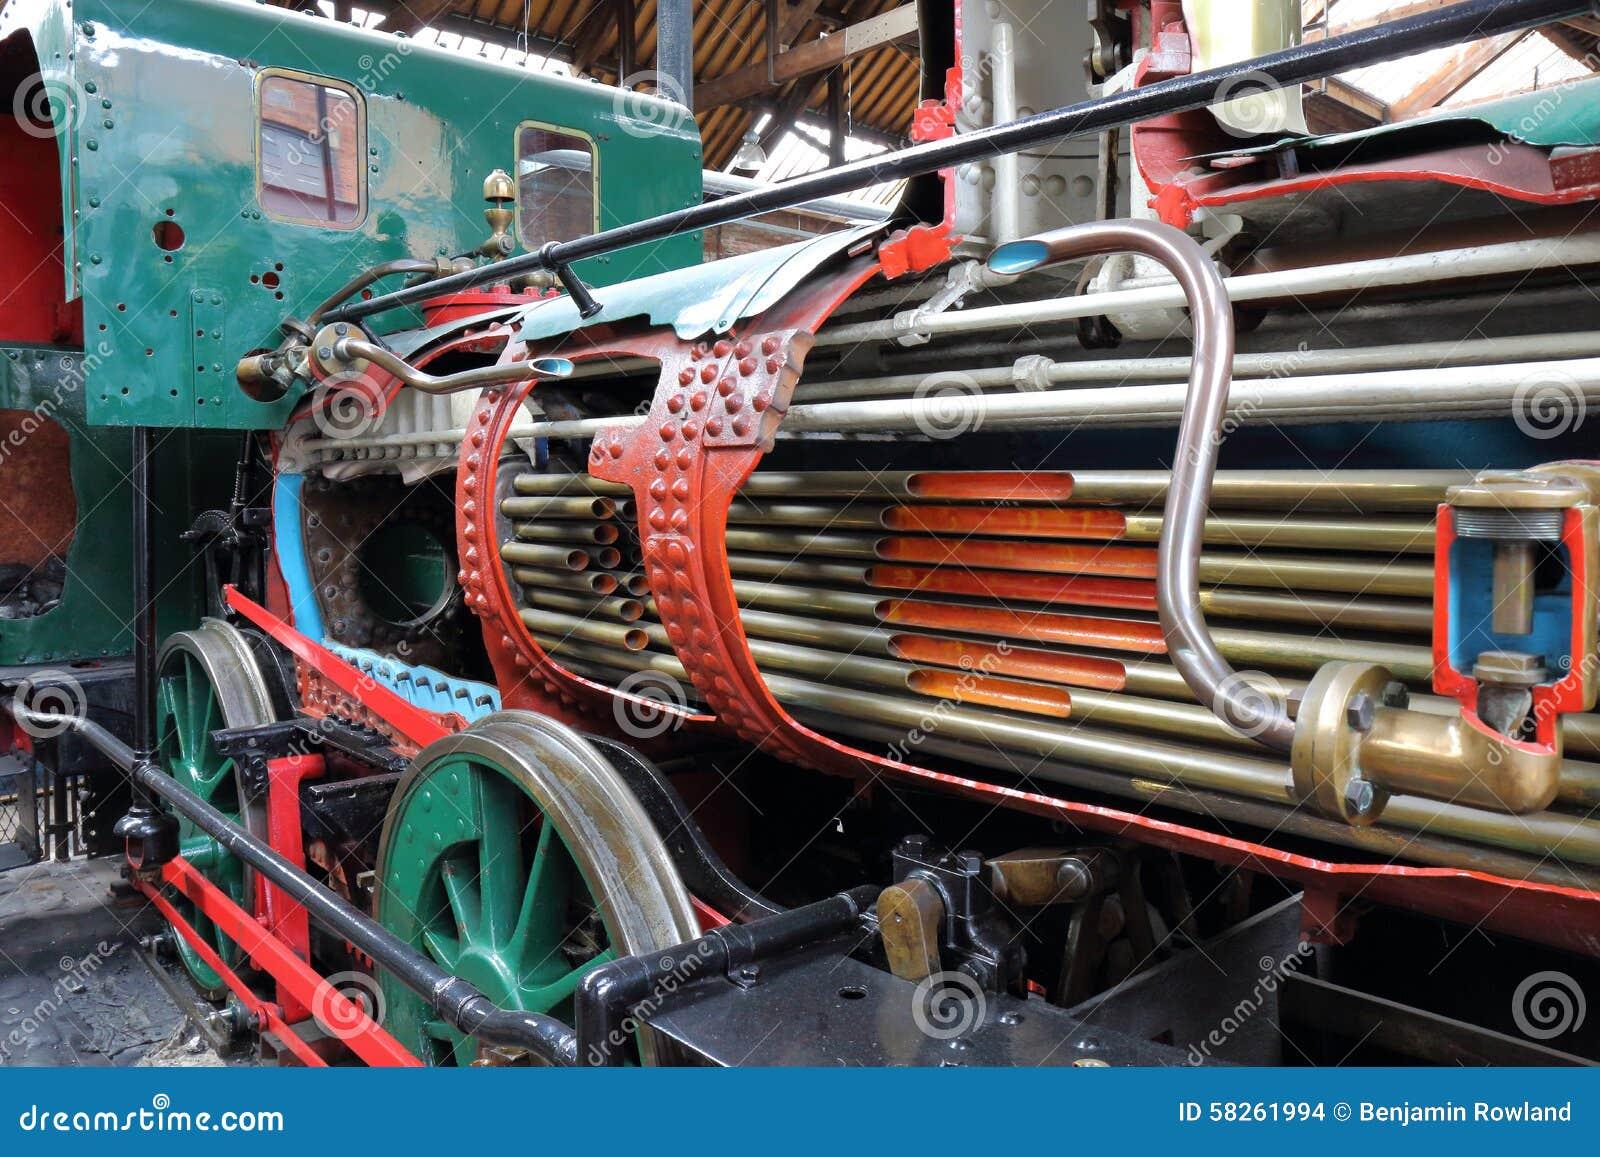 inner workings of steam train stock photo image 58261994 steam train clipart steam train clip art